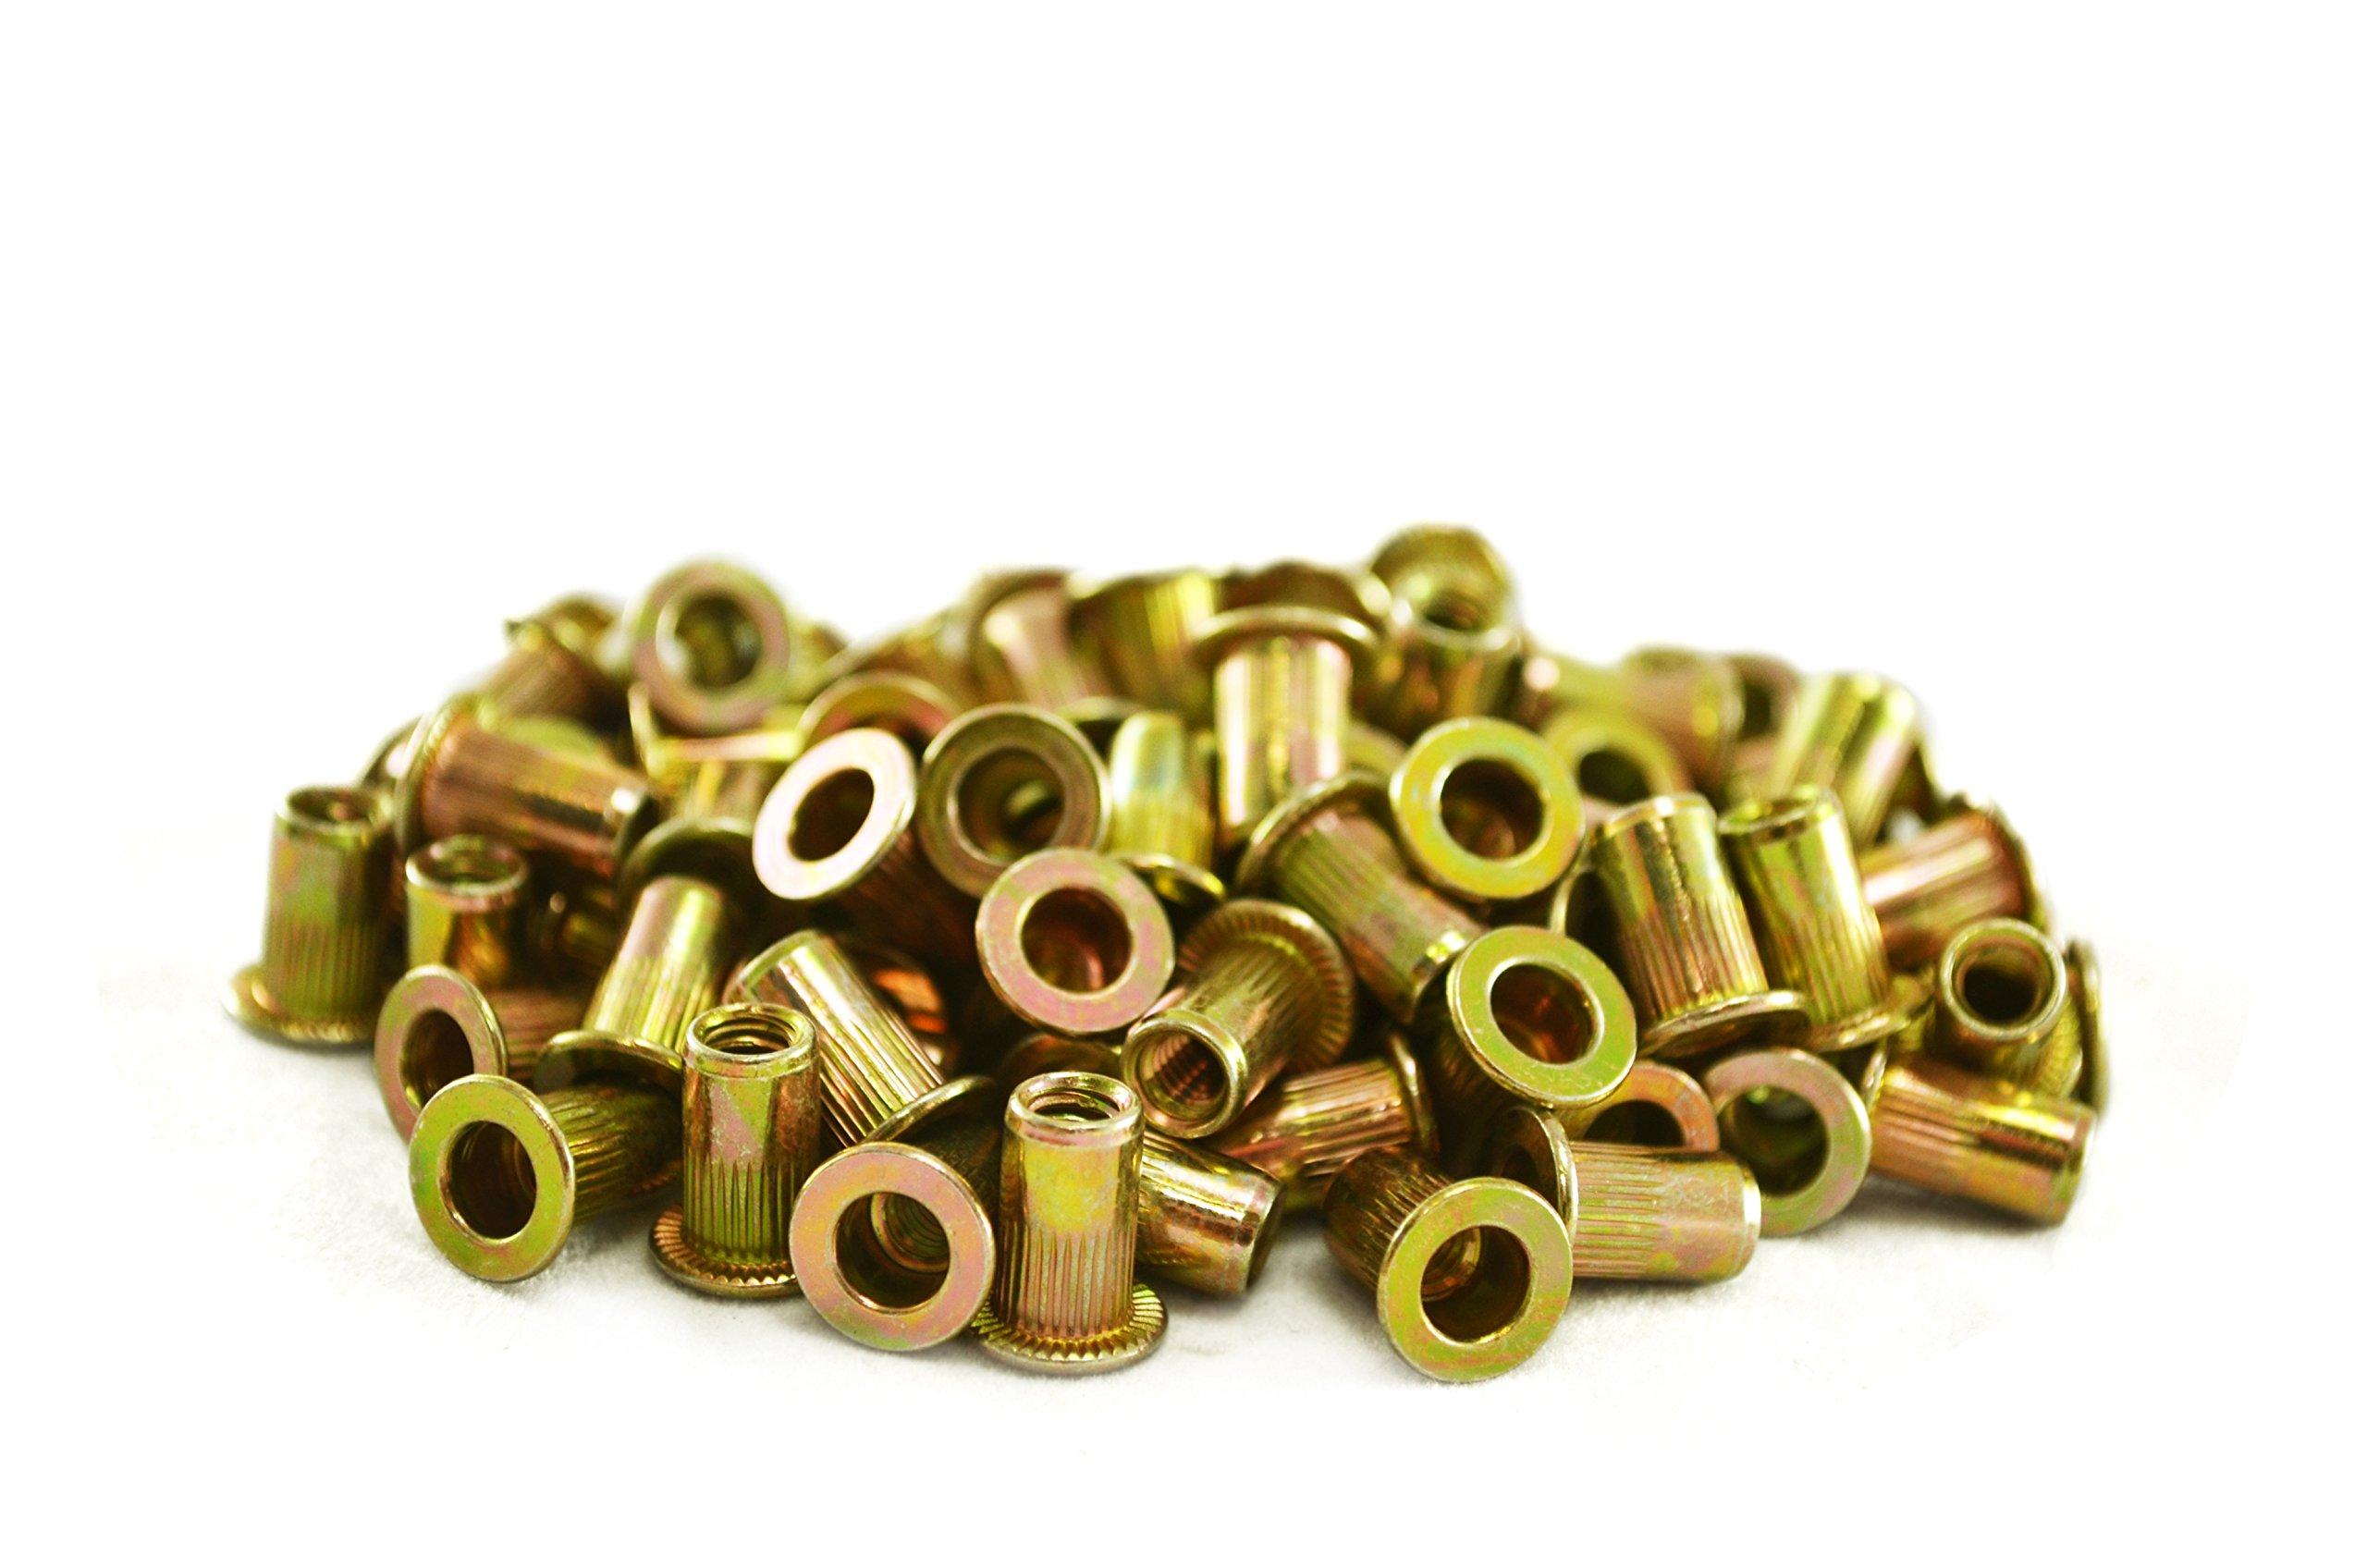 Astro Pneumatic Tool RN832 #8-32 Steel Rivet Nuts (100 Piece) by Astro Pneumatic Tool (Image #1)